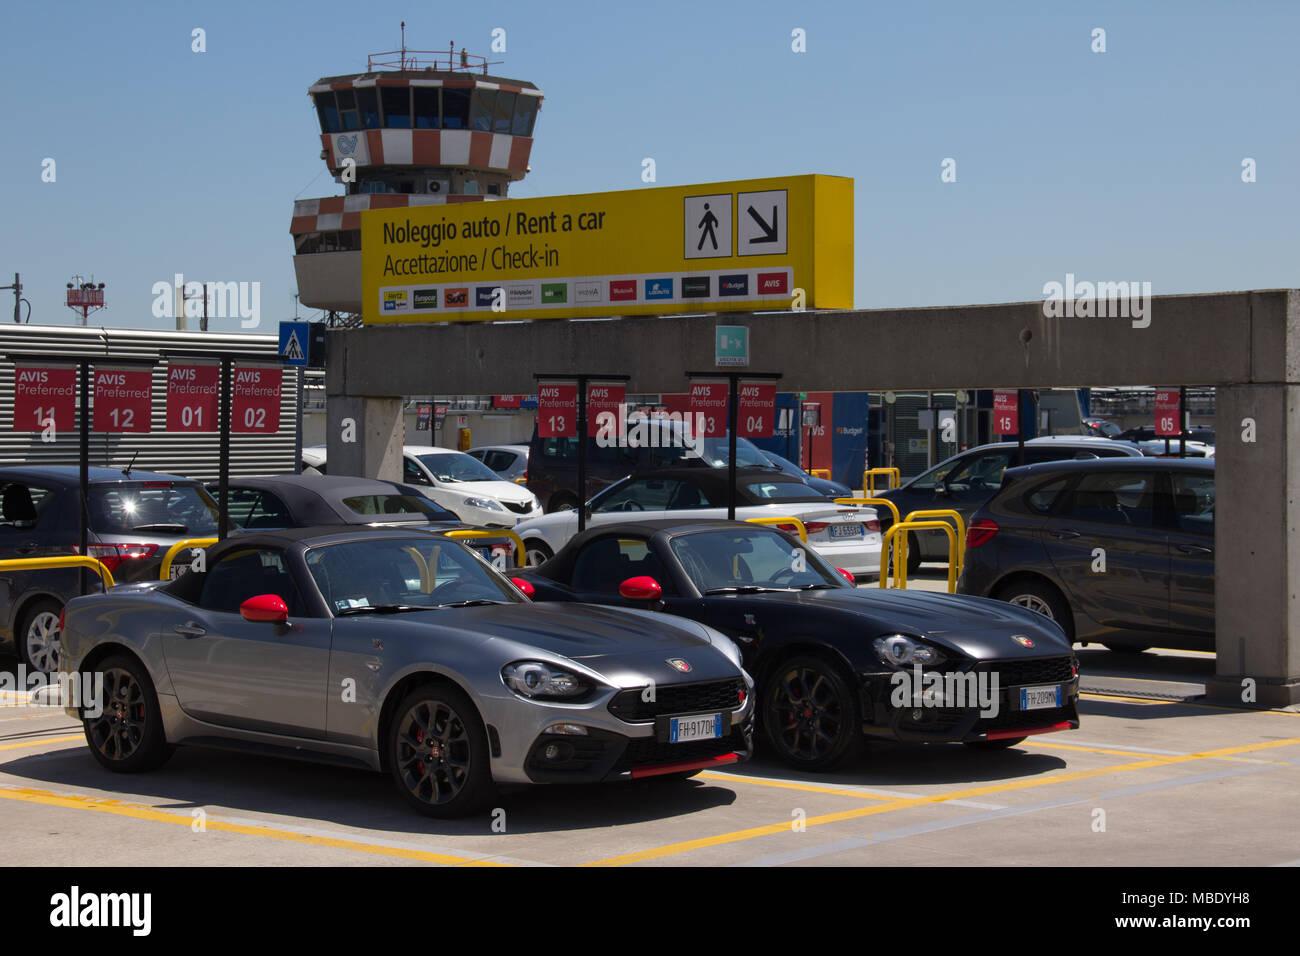 Rental Cars Near Venice Airport Italy Stock Photo 179171924 Alamy